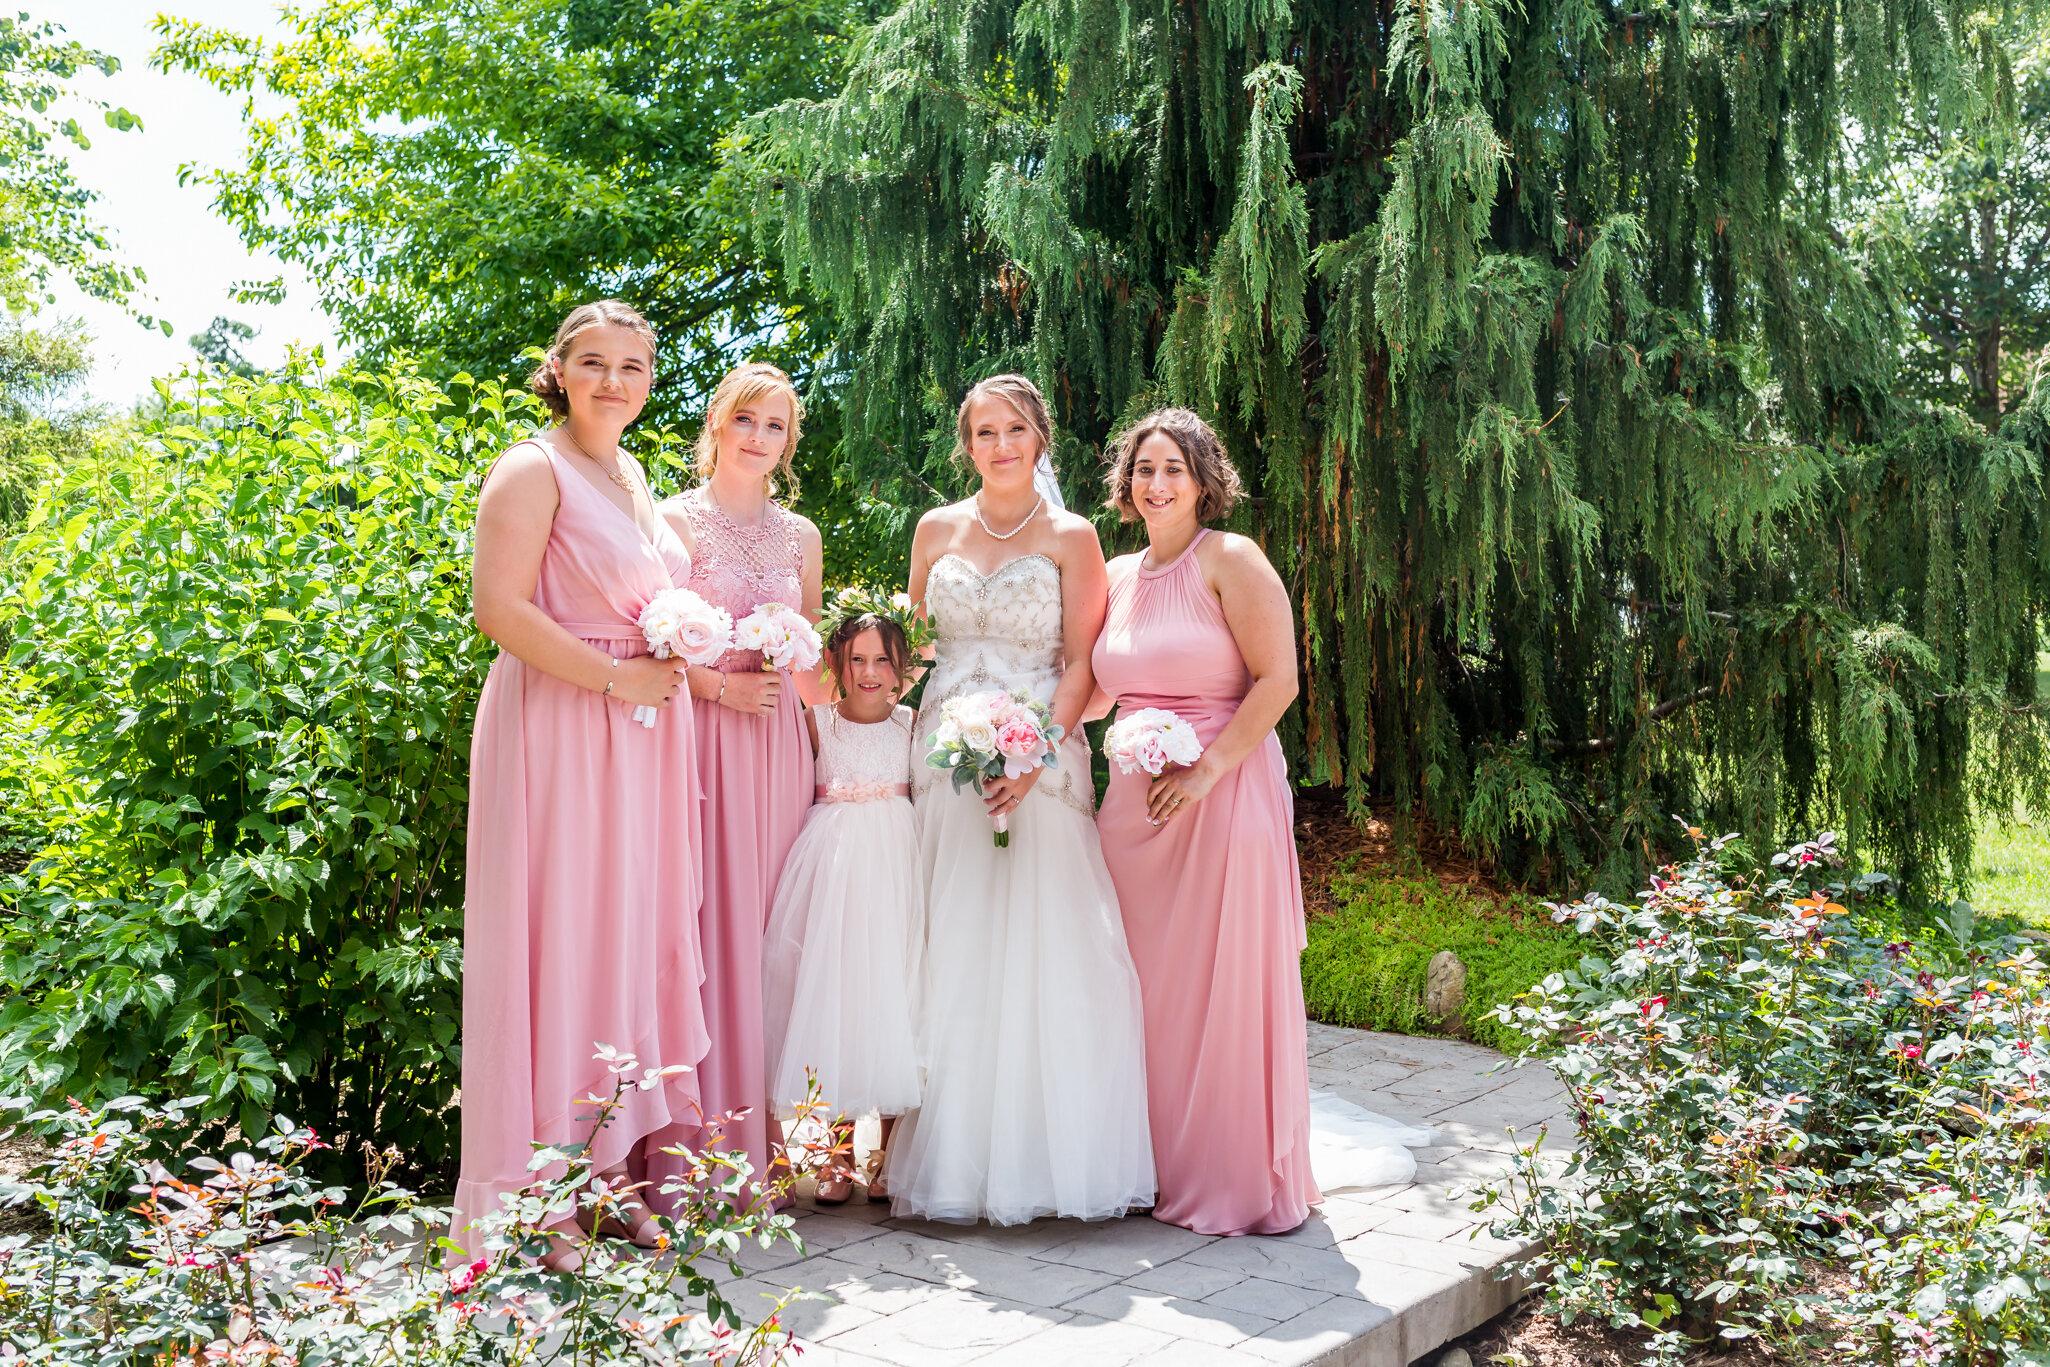 New Castle Arts Park Wedding Photography - S8278.JPG